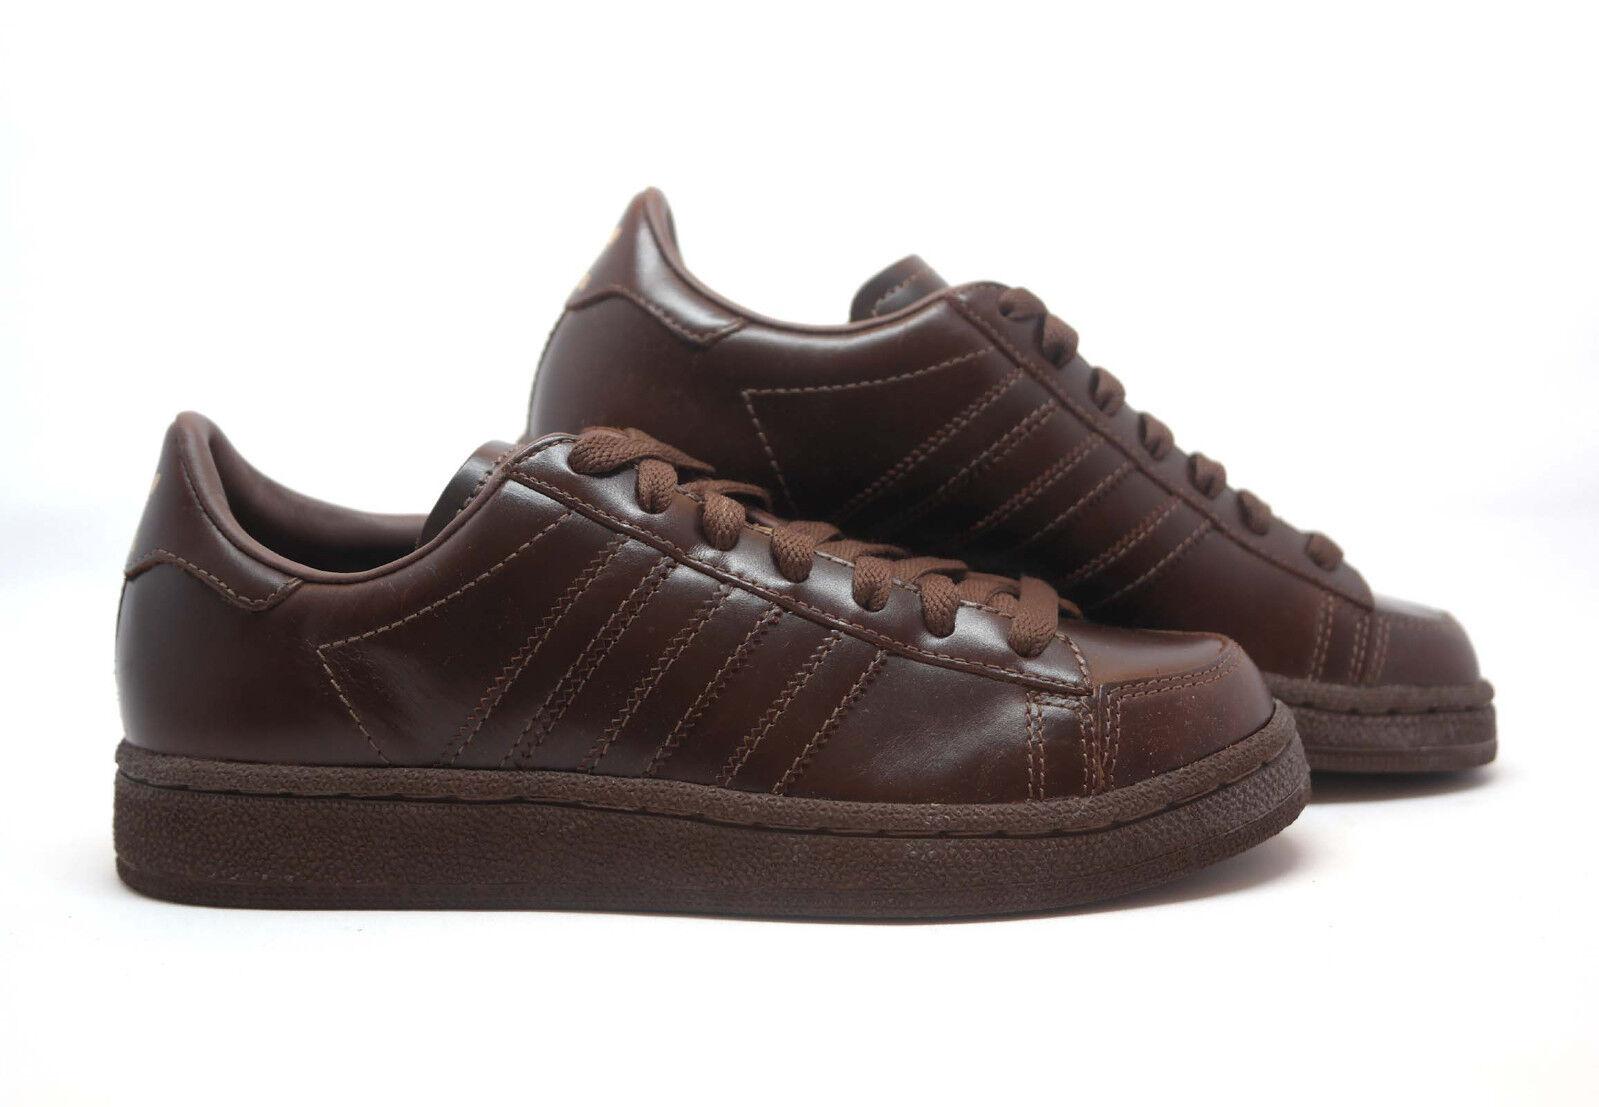 Adidas kreem lo scarpe v2 abdul - jabbar scarpe lo 133203 uomini 5, 5, 7 donne 6, 7, 8 9b713a